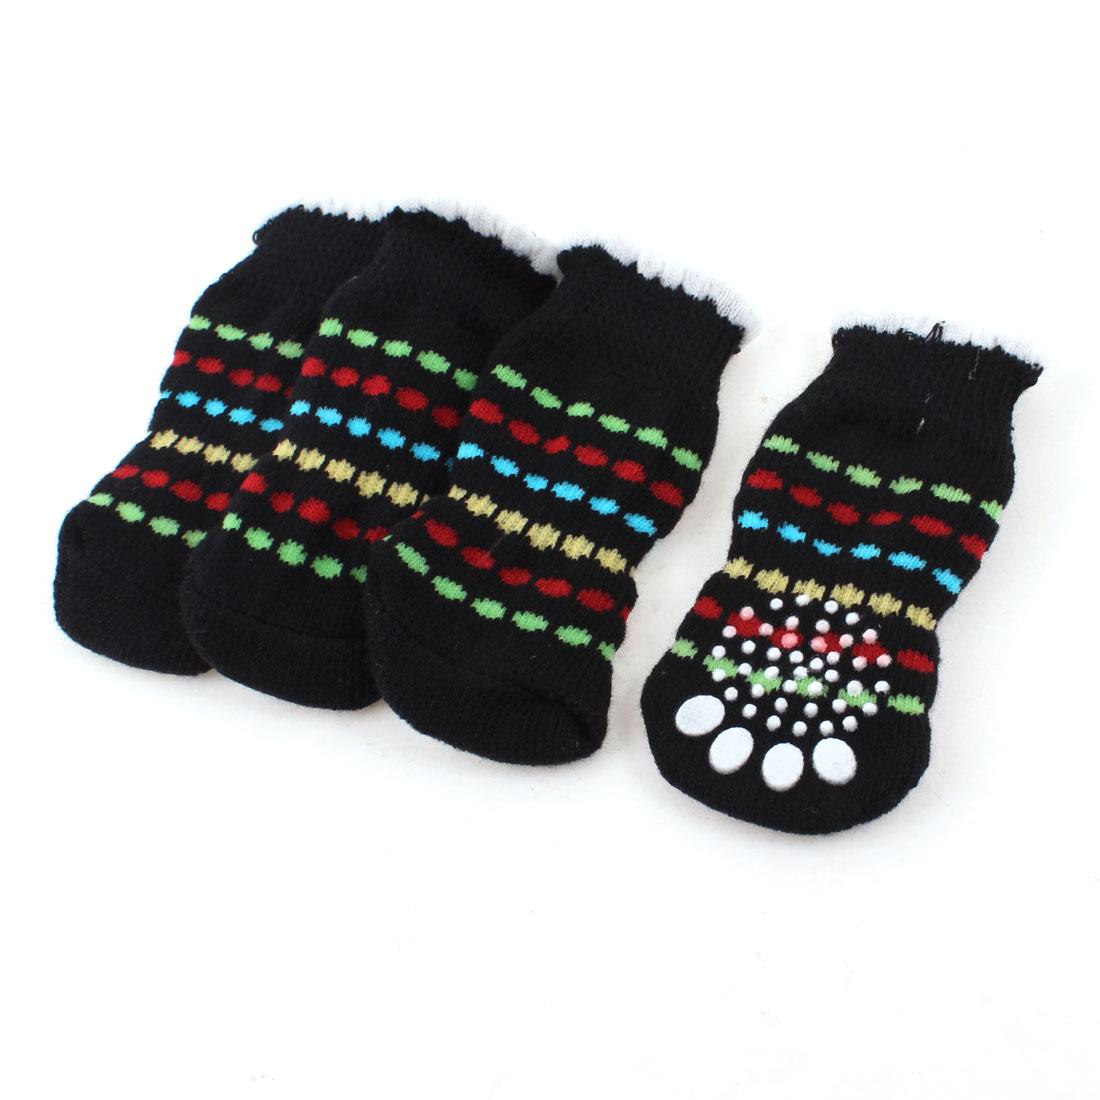 2 Pairs Black White Knitting Paw Pattern Elastic Nonslip Pet Dog Puppy Socks